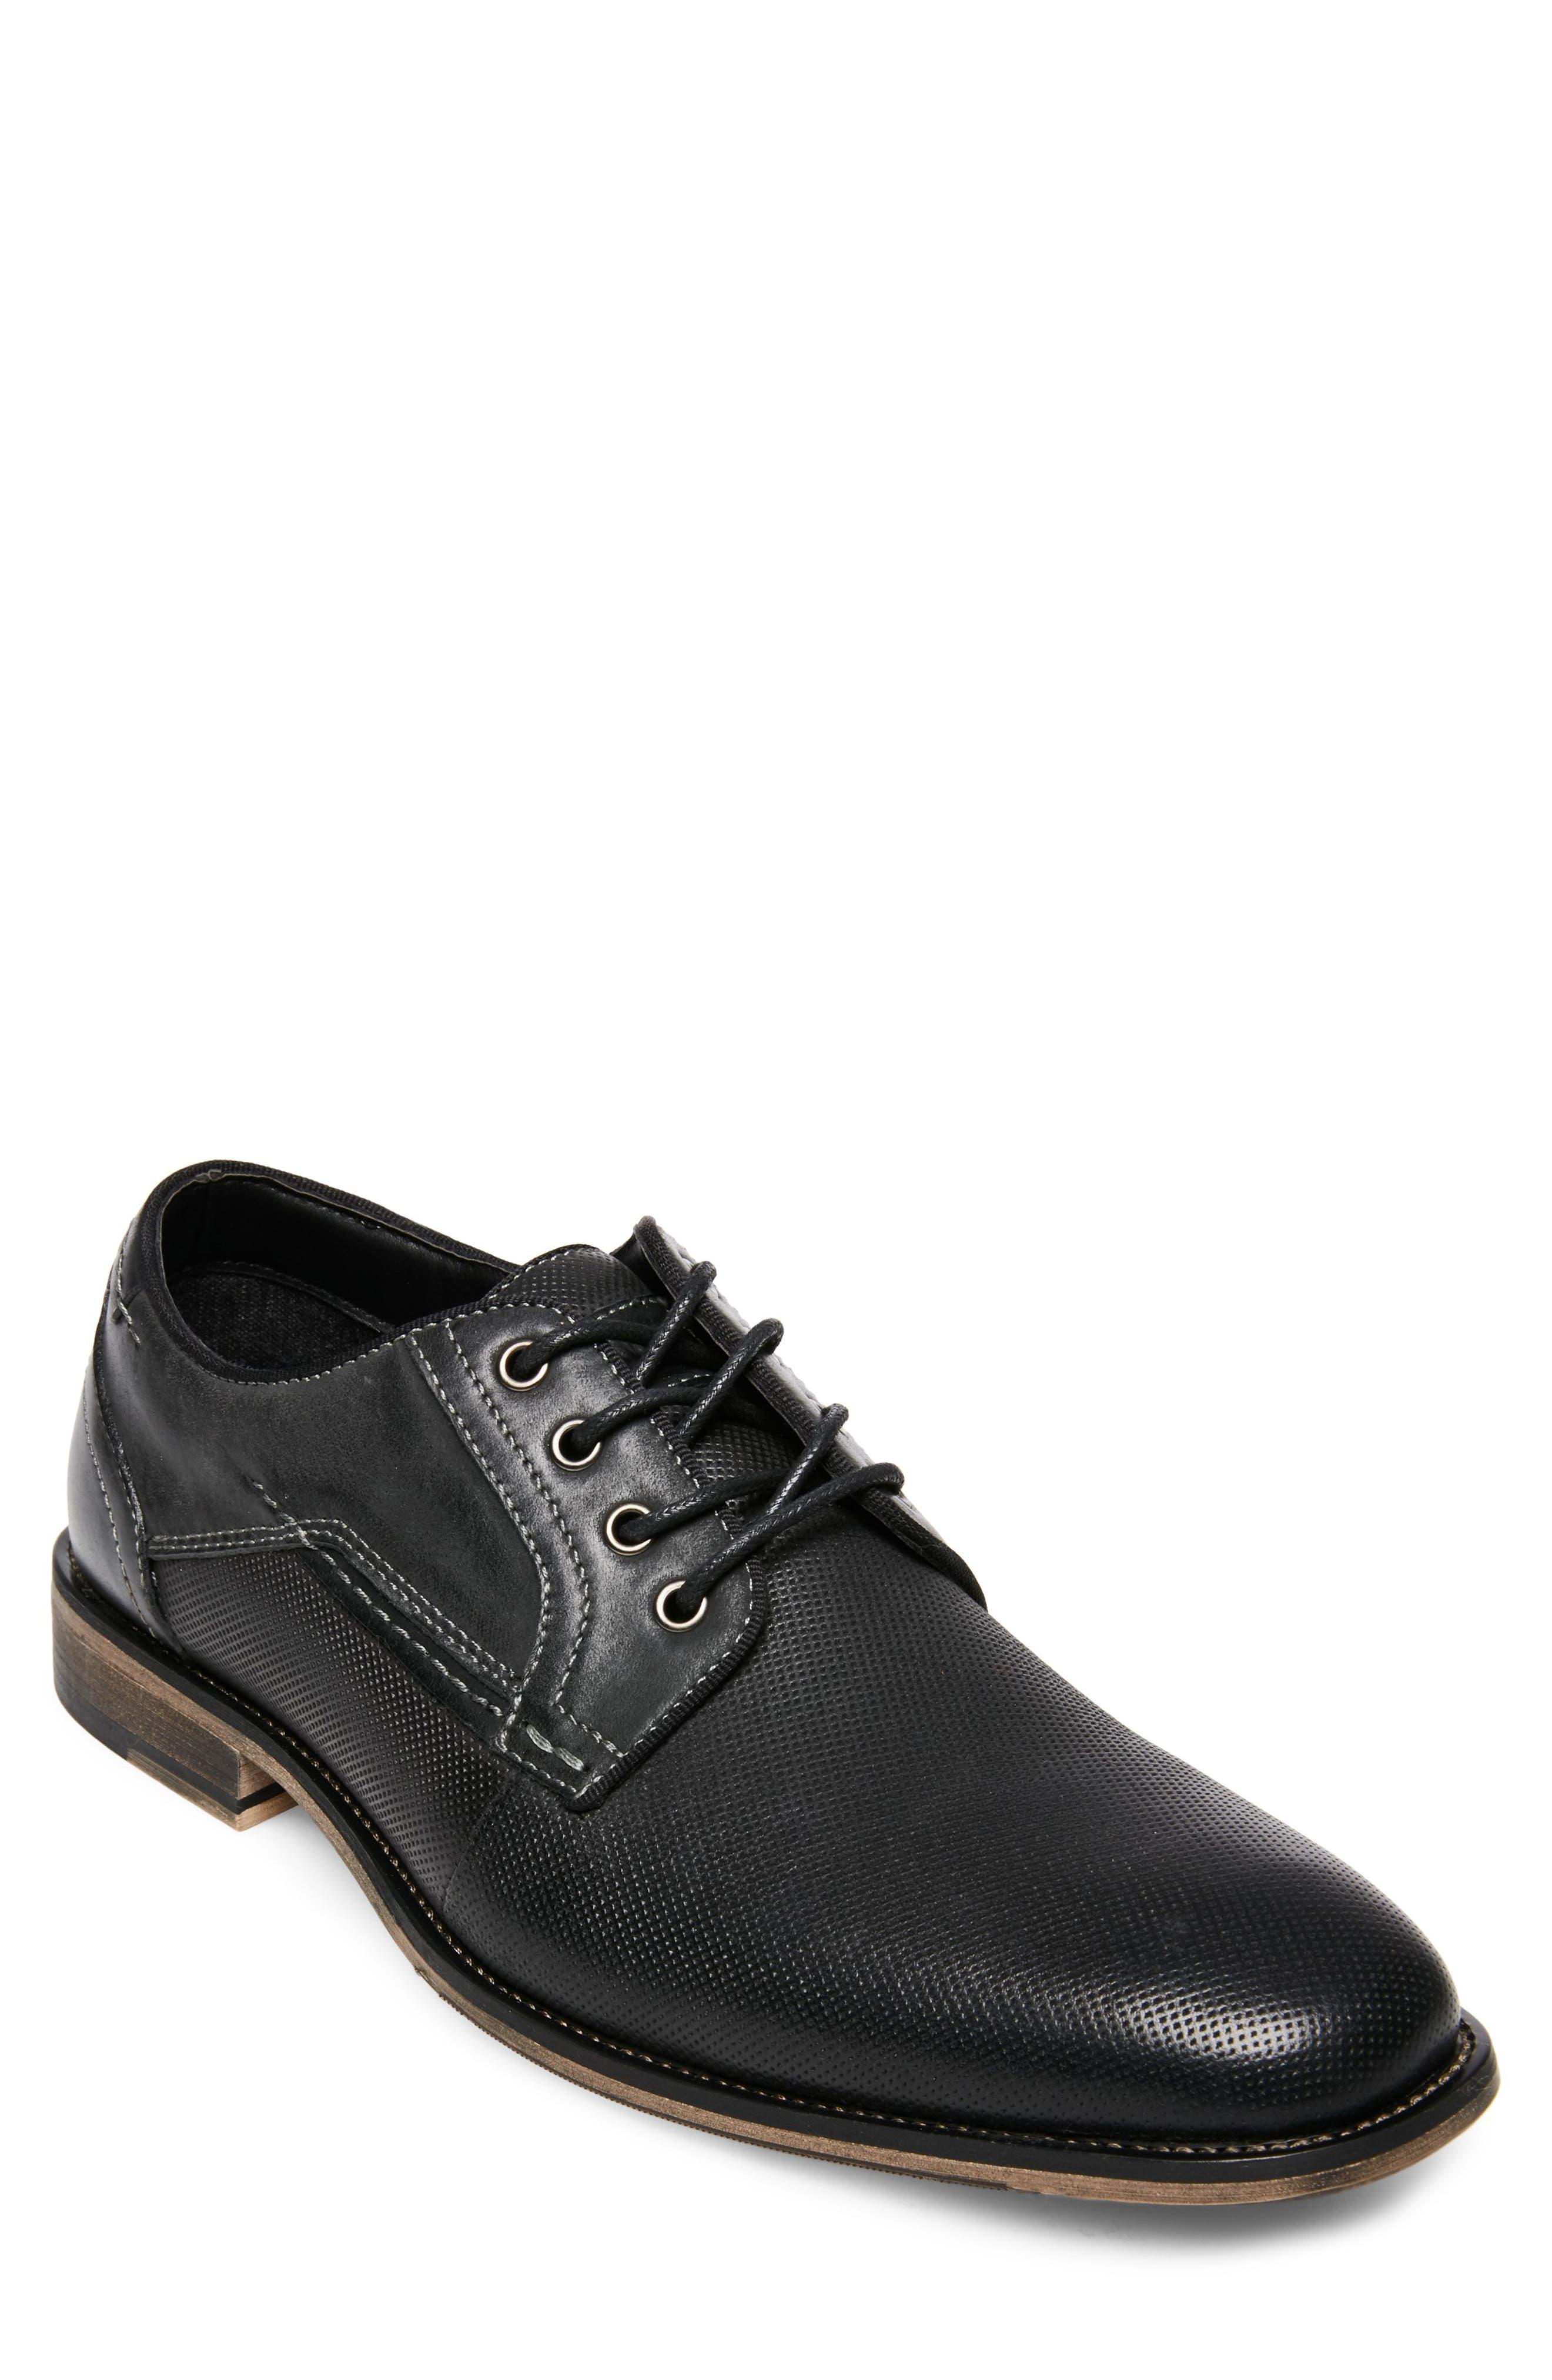 Jaysun Embossed Plain Toe Derby,                         Main,                         color, Dark Grey Leather